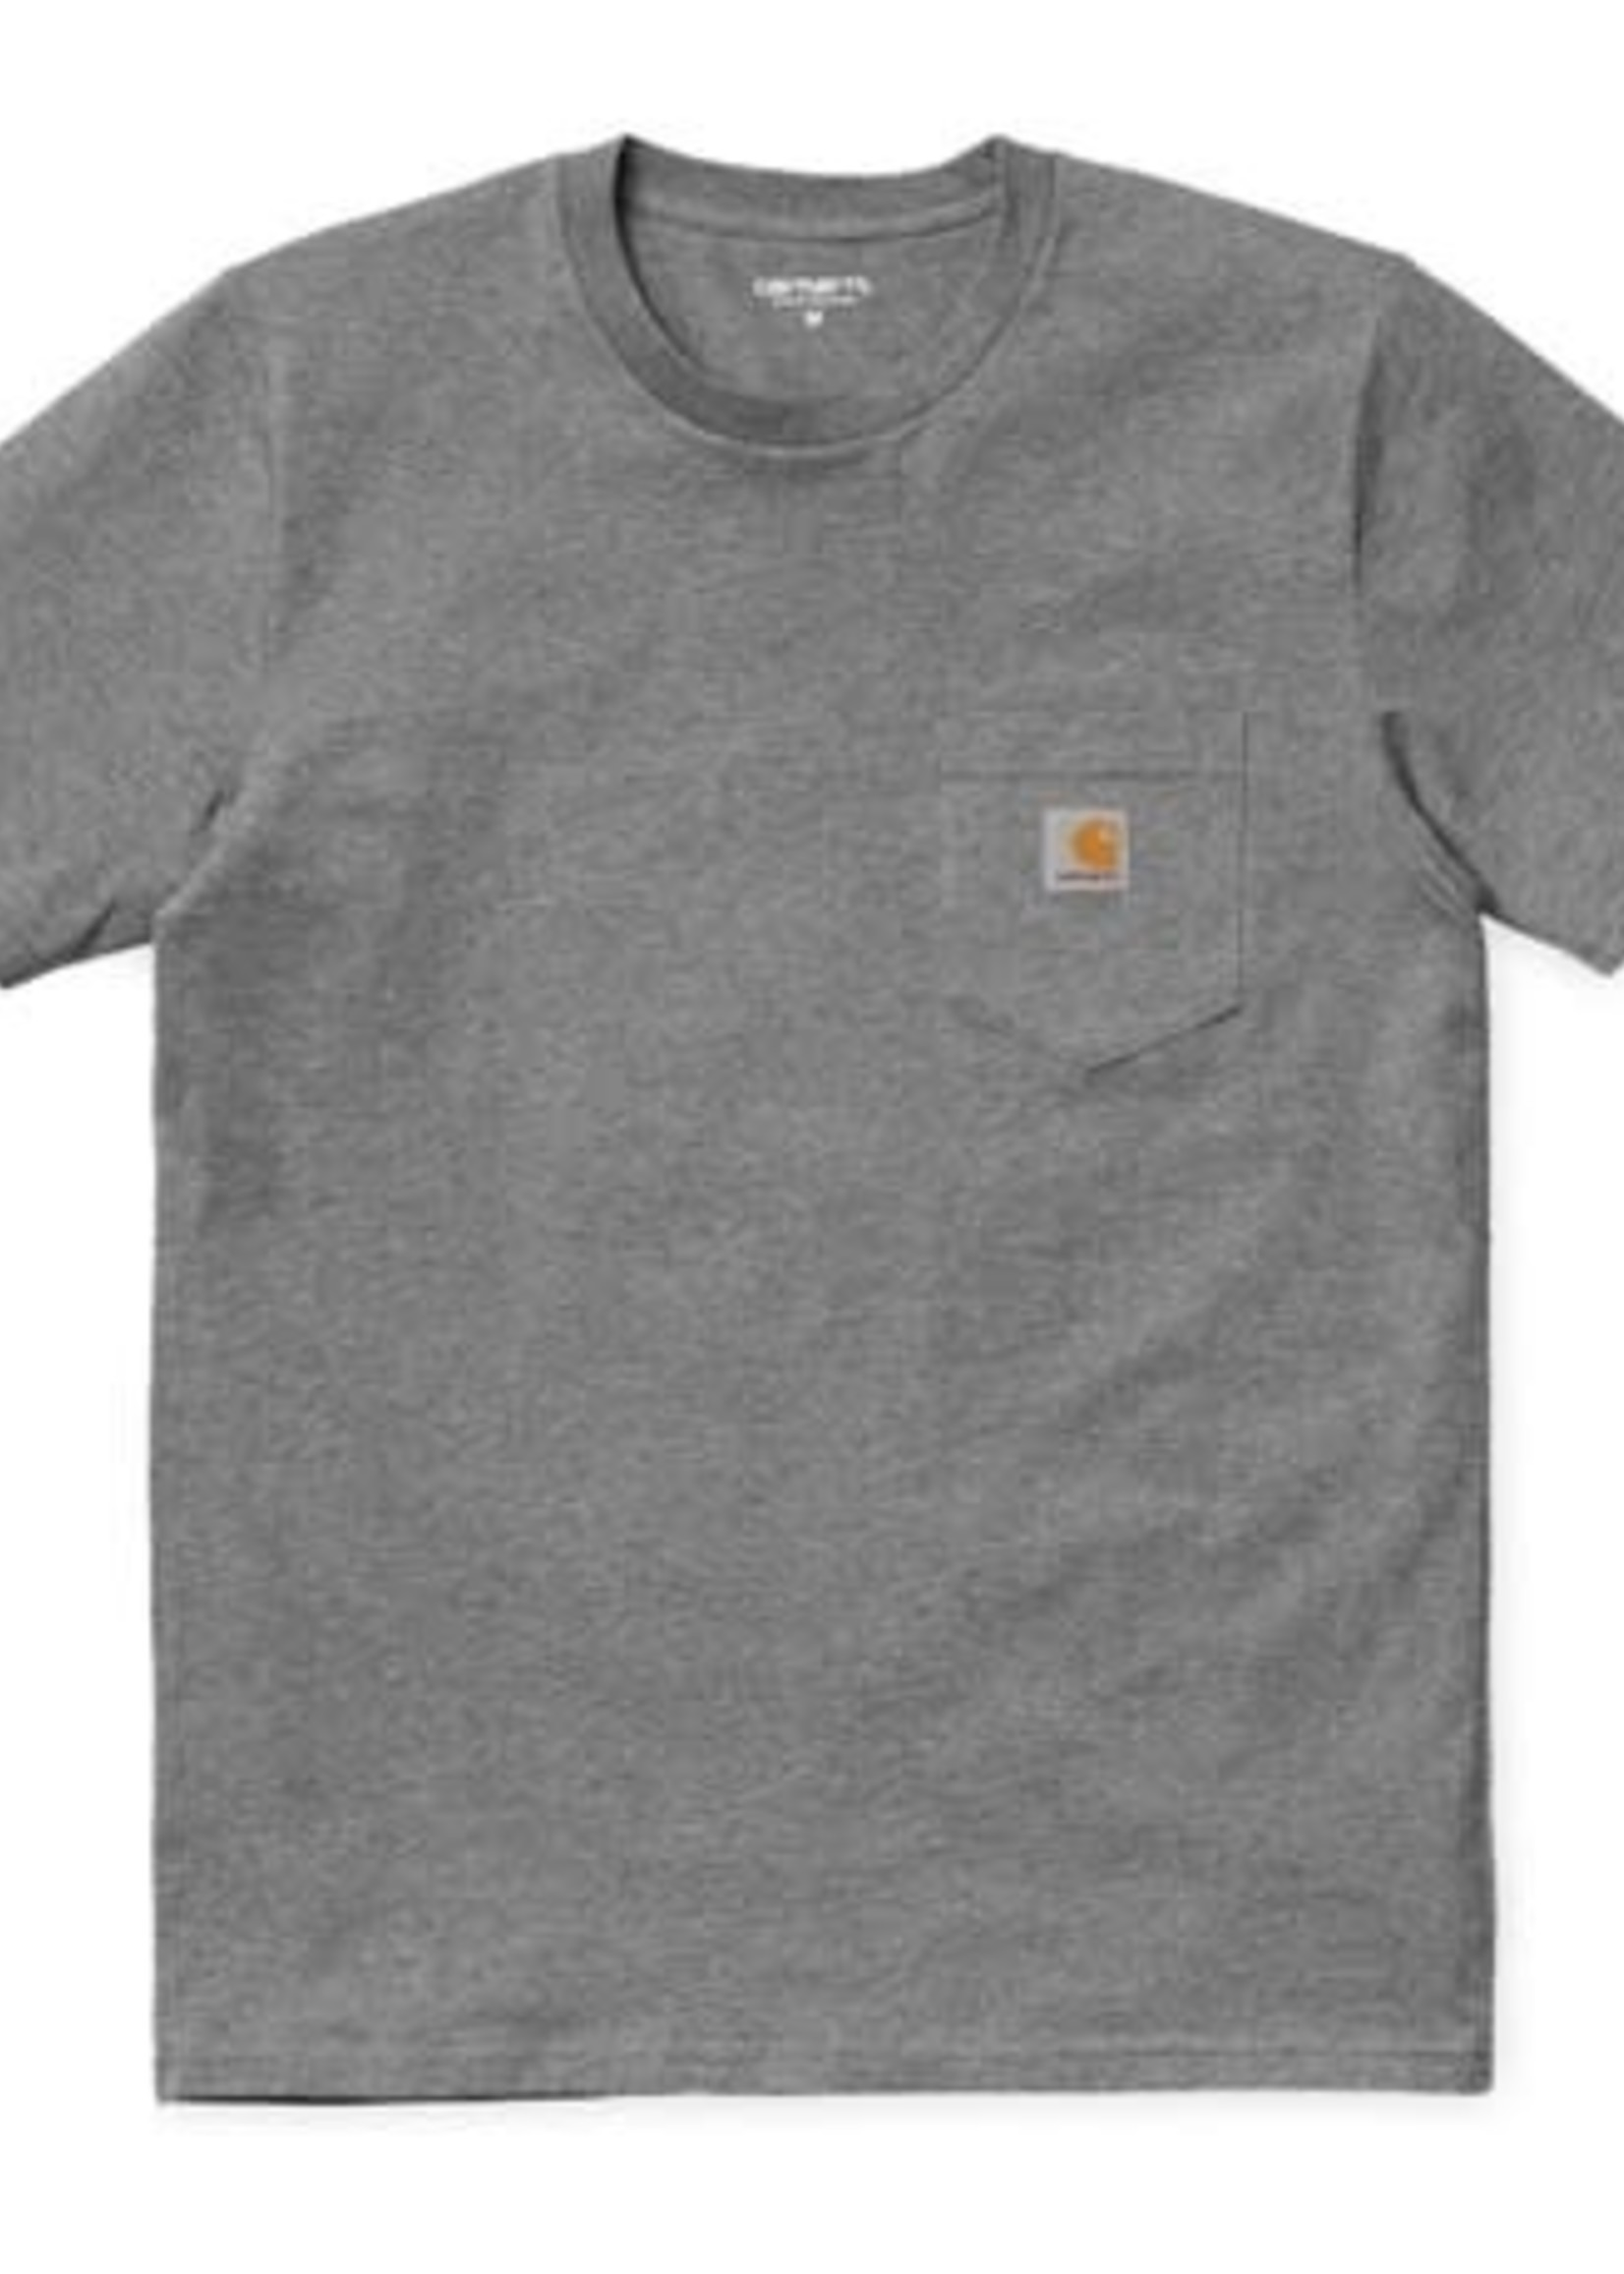 Carhartt Work In Progress Pocket T-shirt in Dark Heather